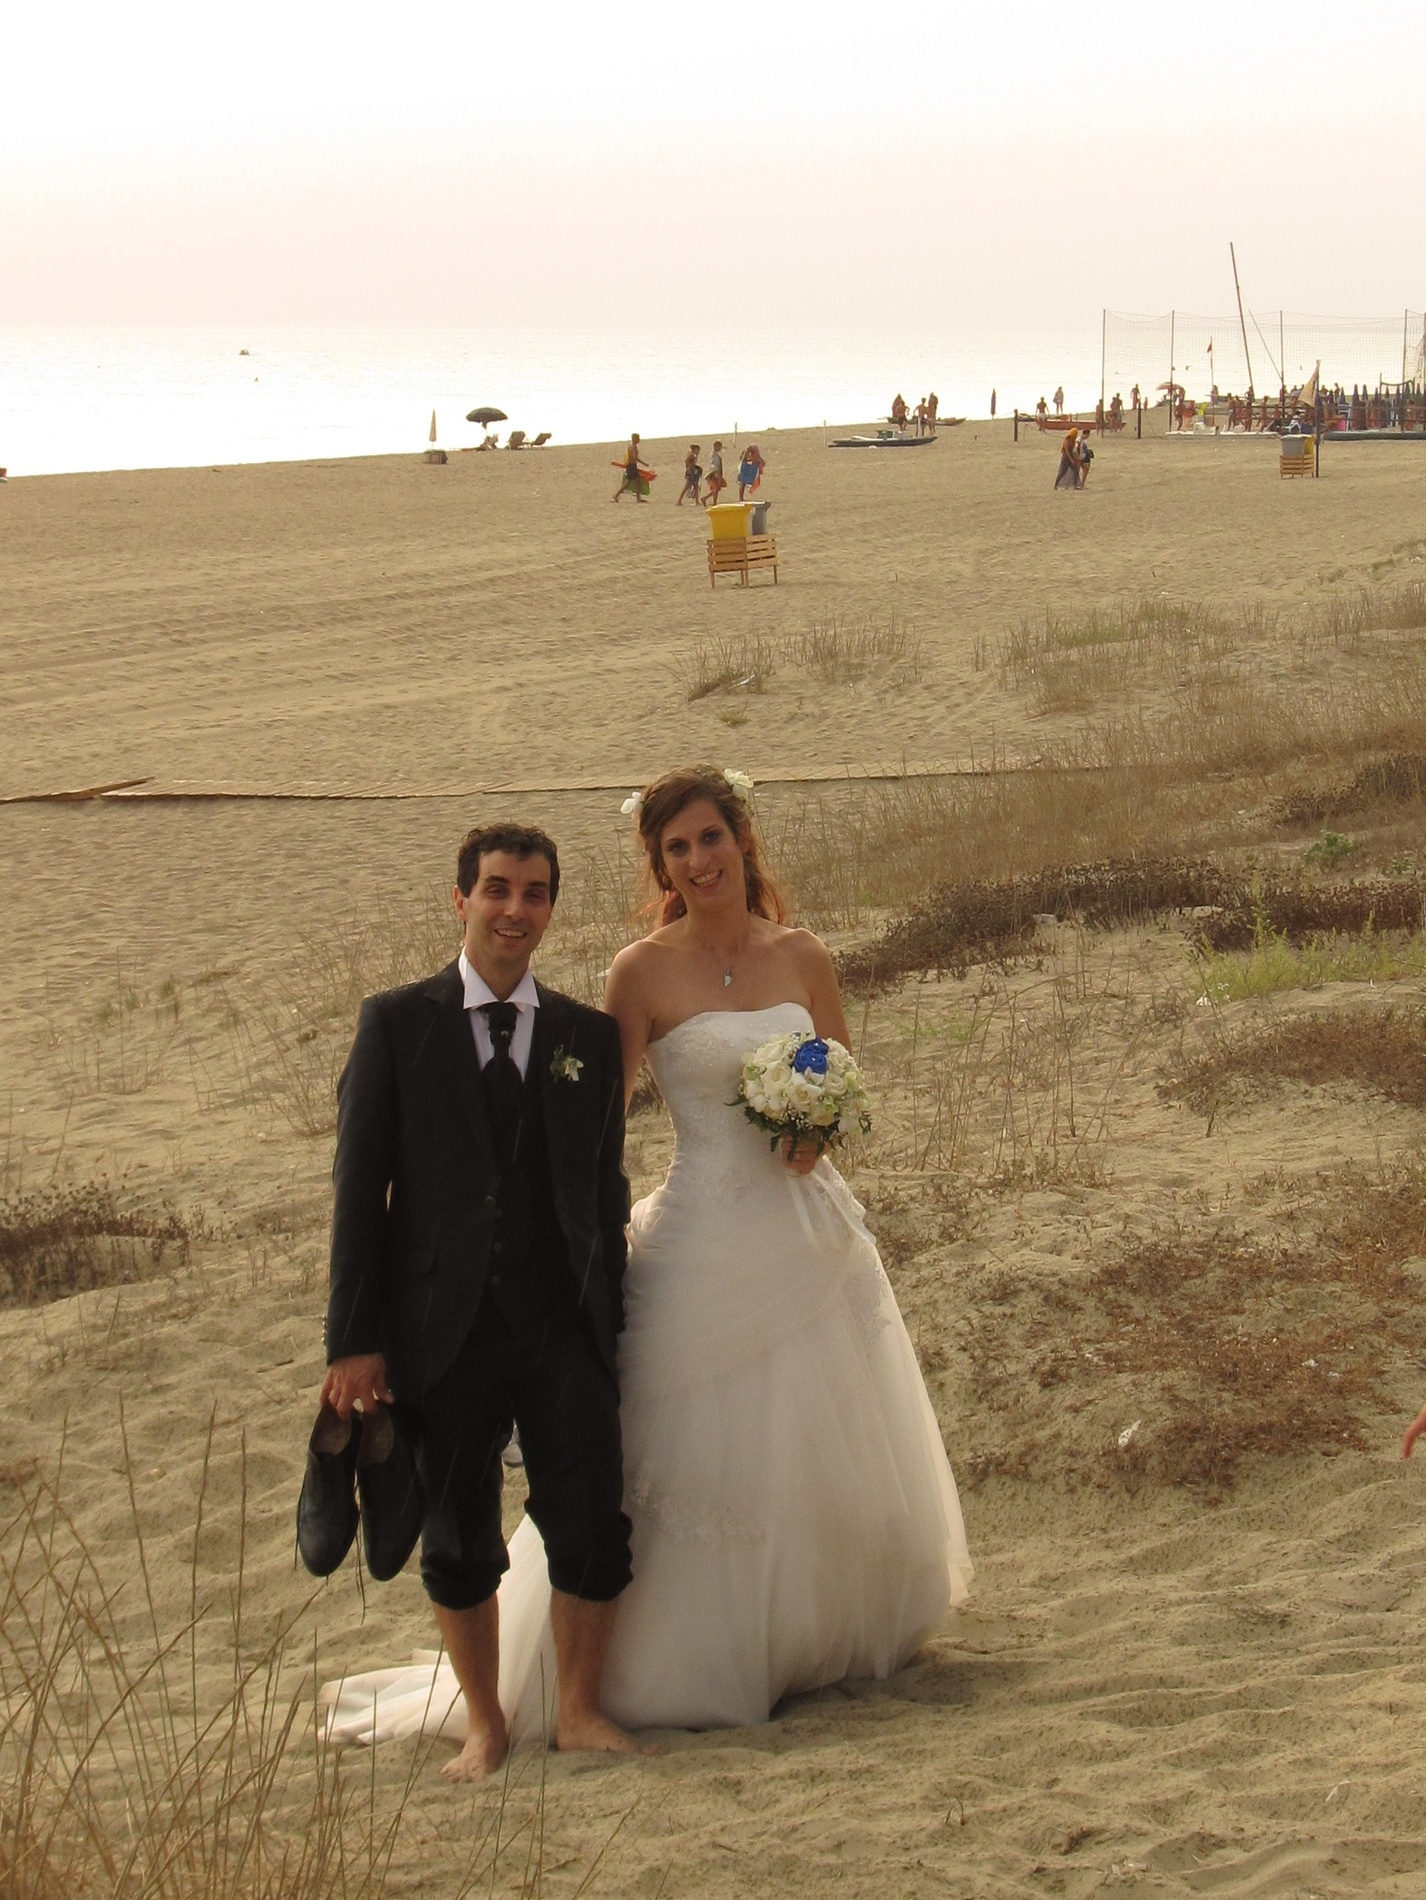 matrimonio-ilaria-torrisi-e-marco-di-lucia-2015-08-08-20-00-05